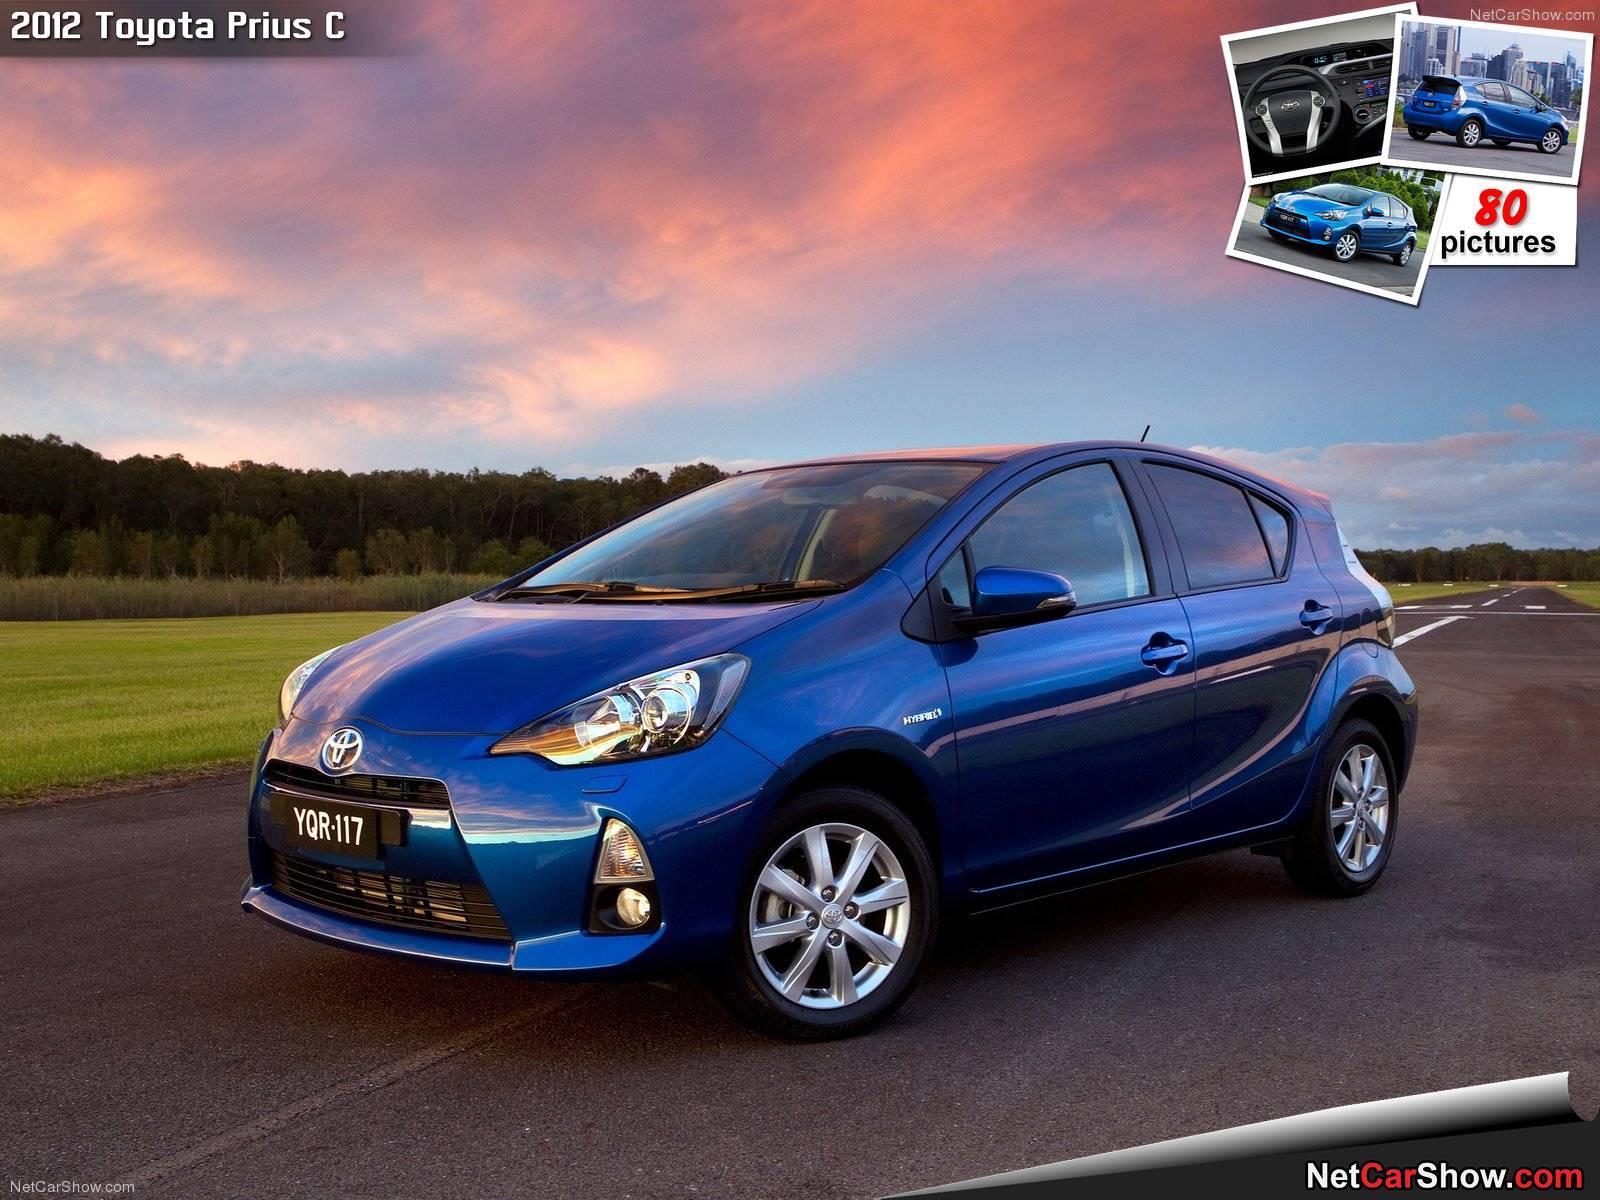 Toyota-Prius_C-2012-1600-05.jpg